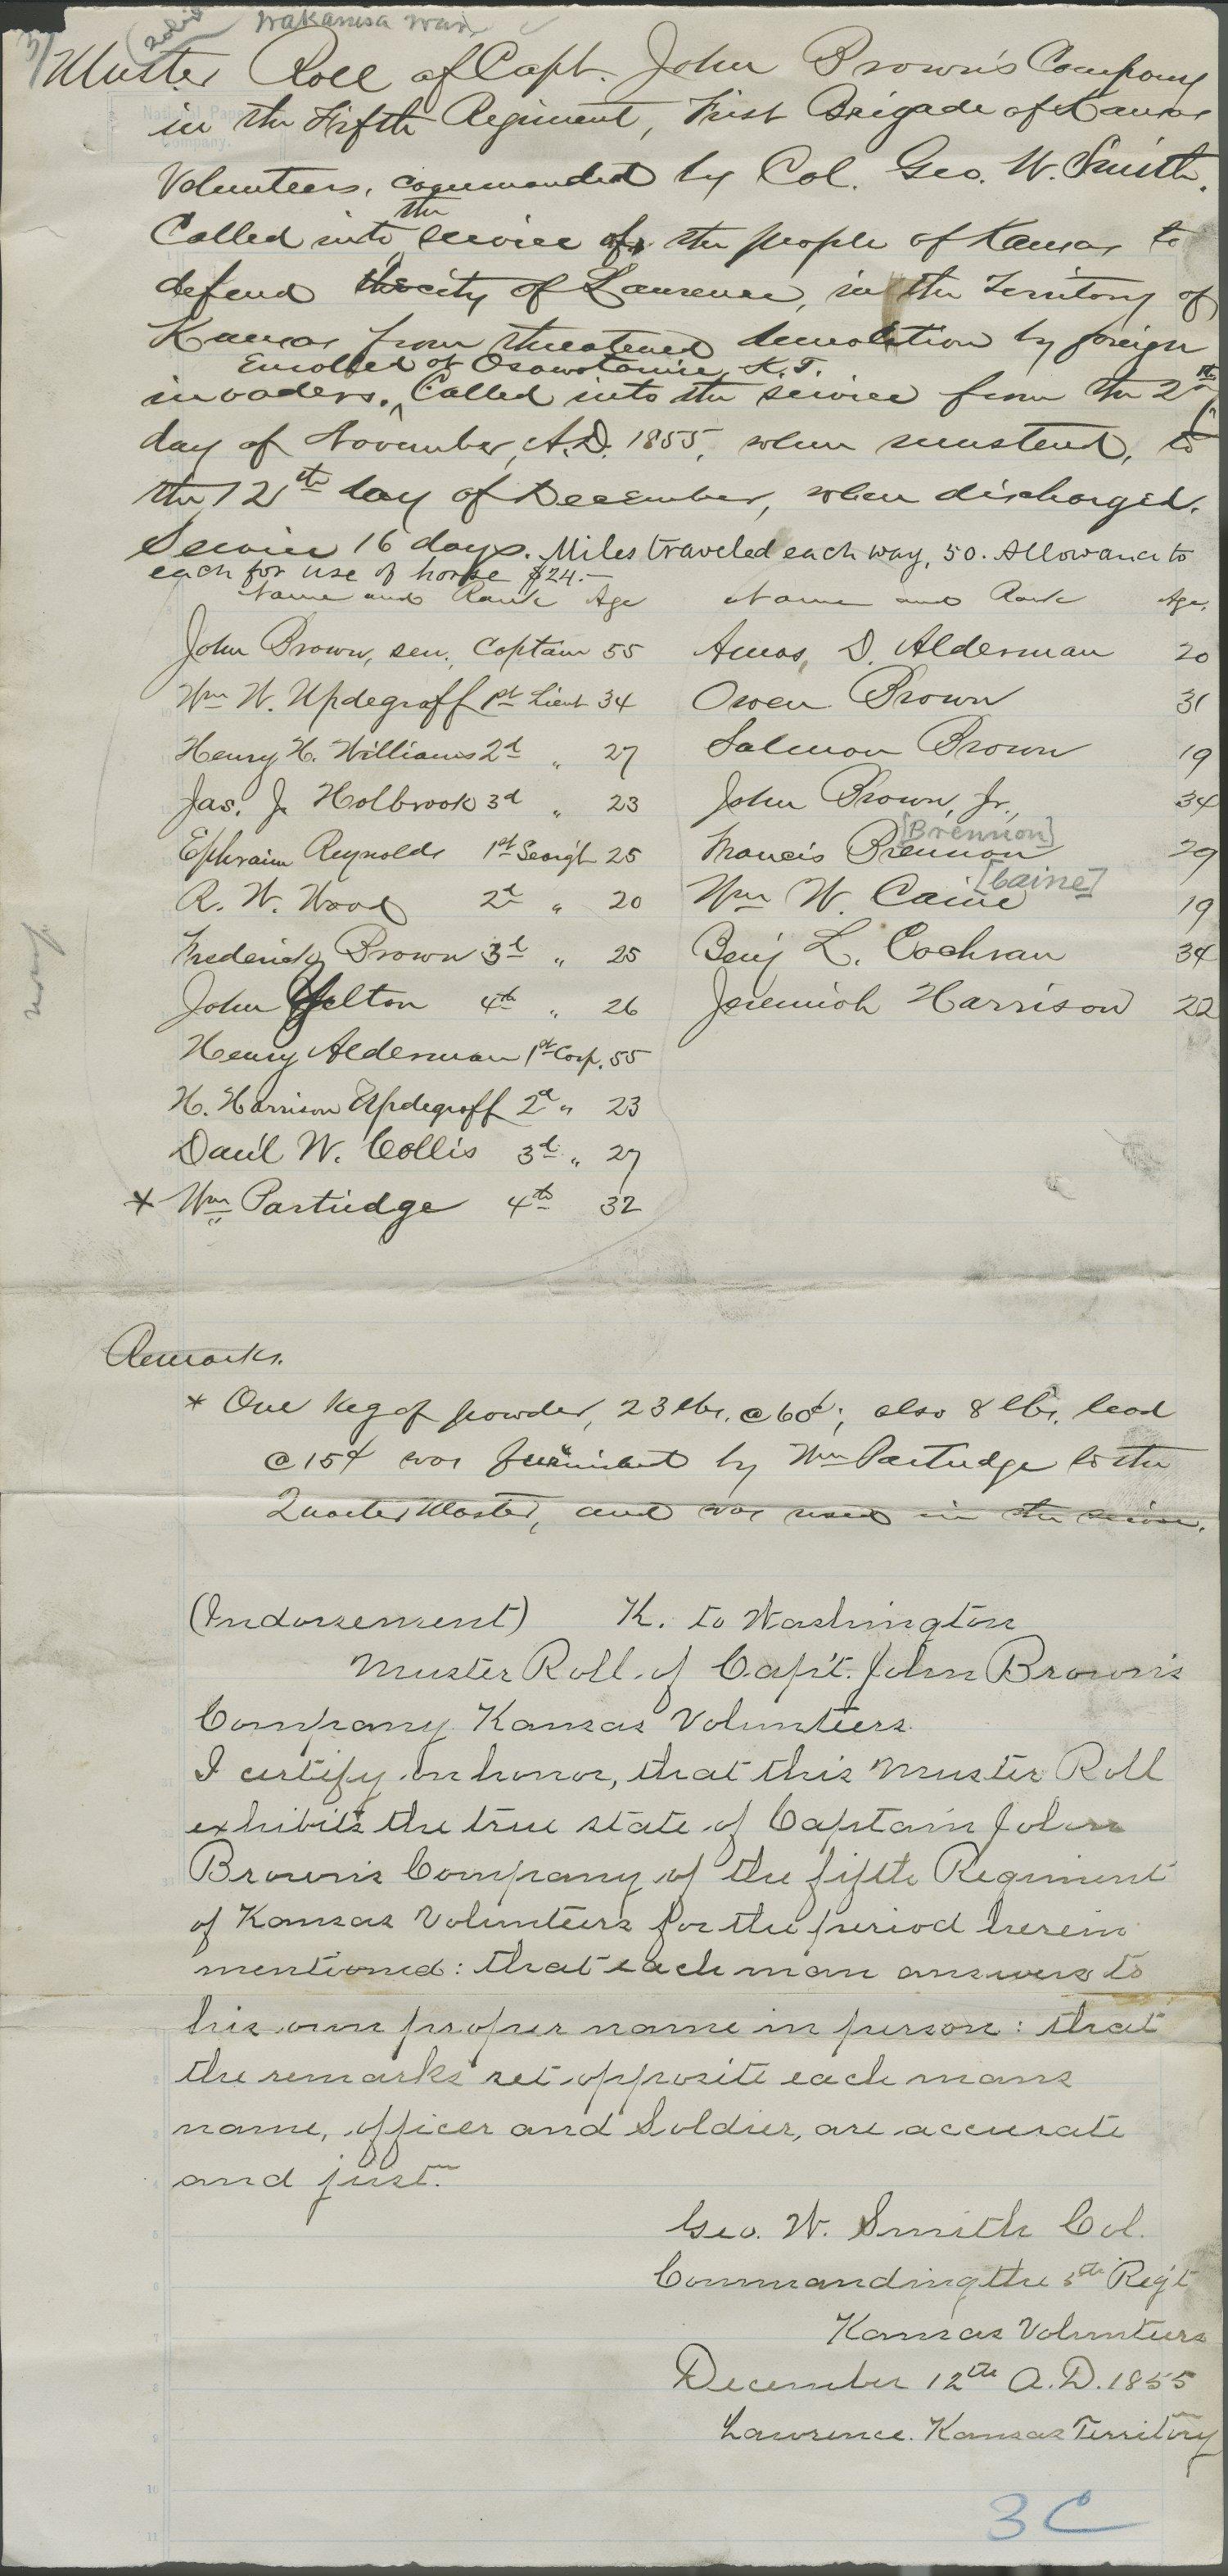 Muster Roll of Captain John Brown's Company, Fifth Regiment, 1st Brigade,  Kansas Volunteers